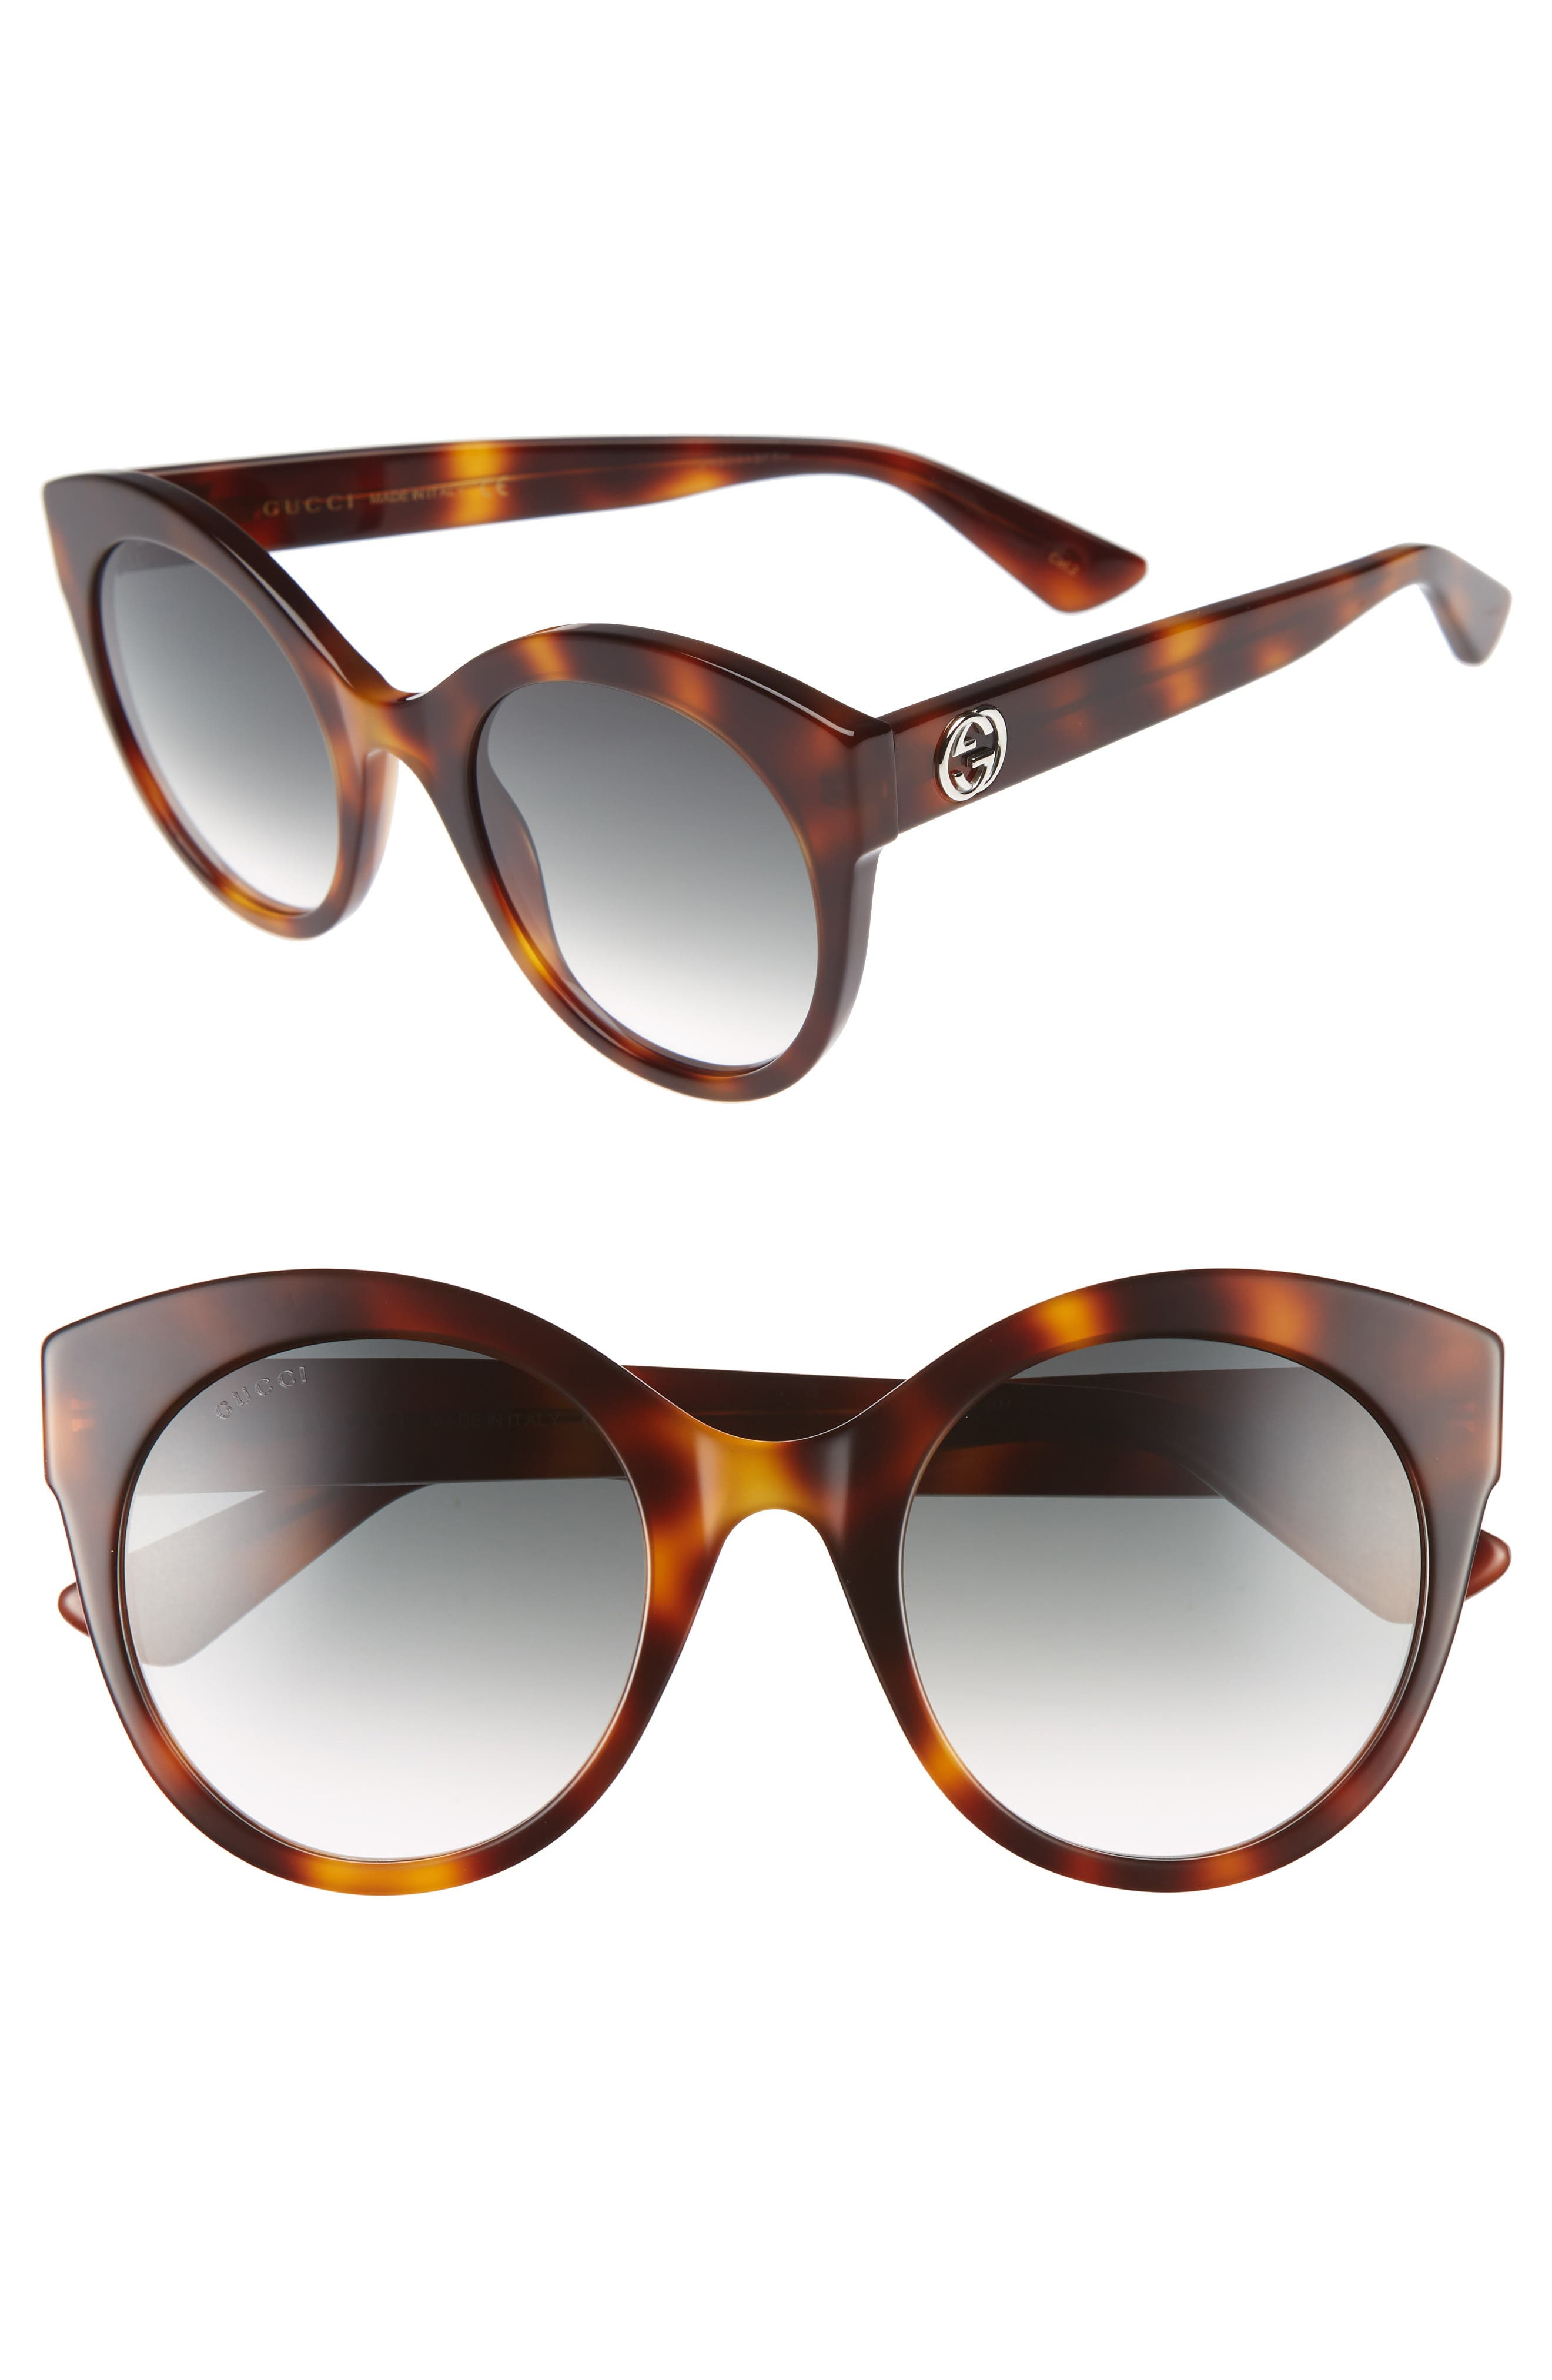 52mm Cat Eye Sunglasses,                             Main thumbnail 1, color,                             HAVANA/ GREEN